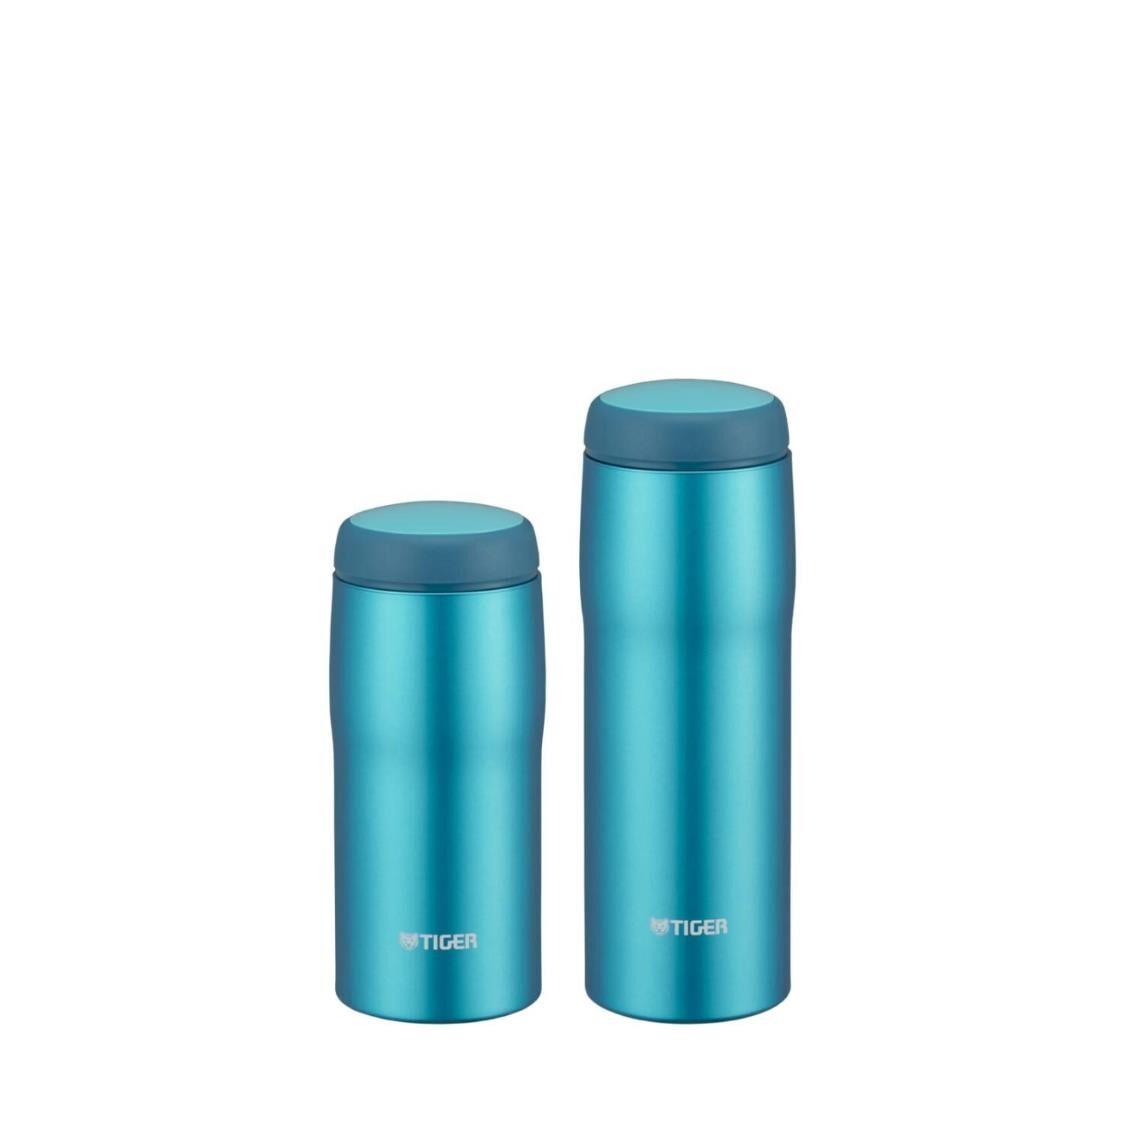 Tiger Bundle - 360ml  480ml Double Stainless Steel Mug Set Bright Blue